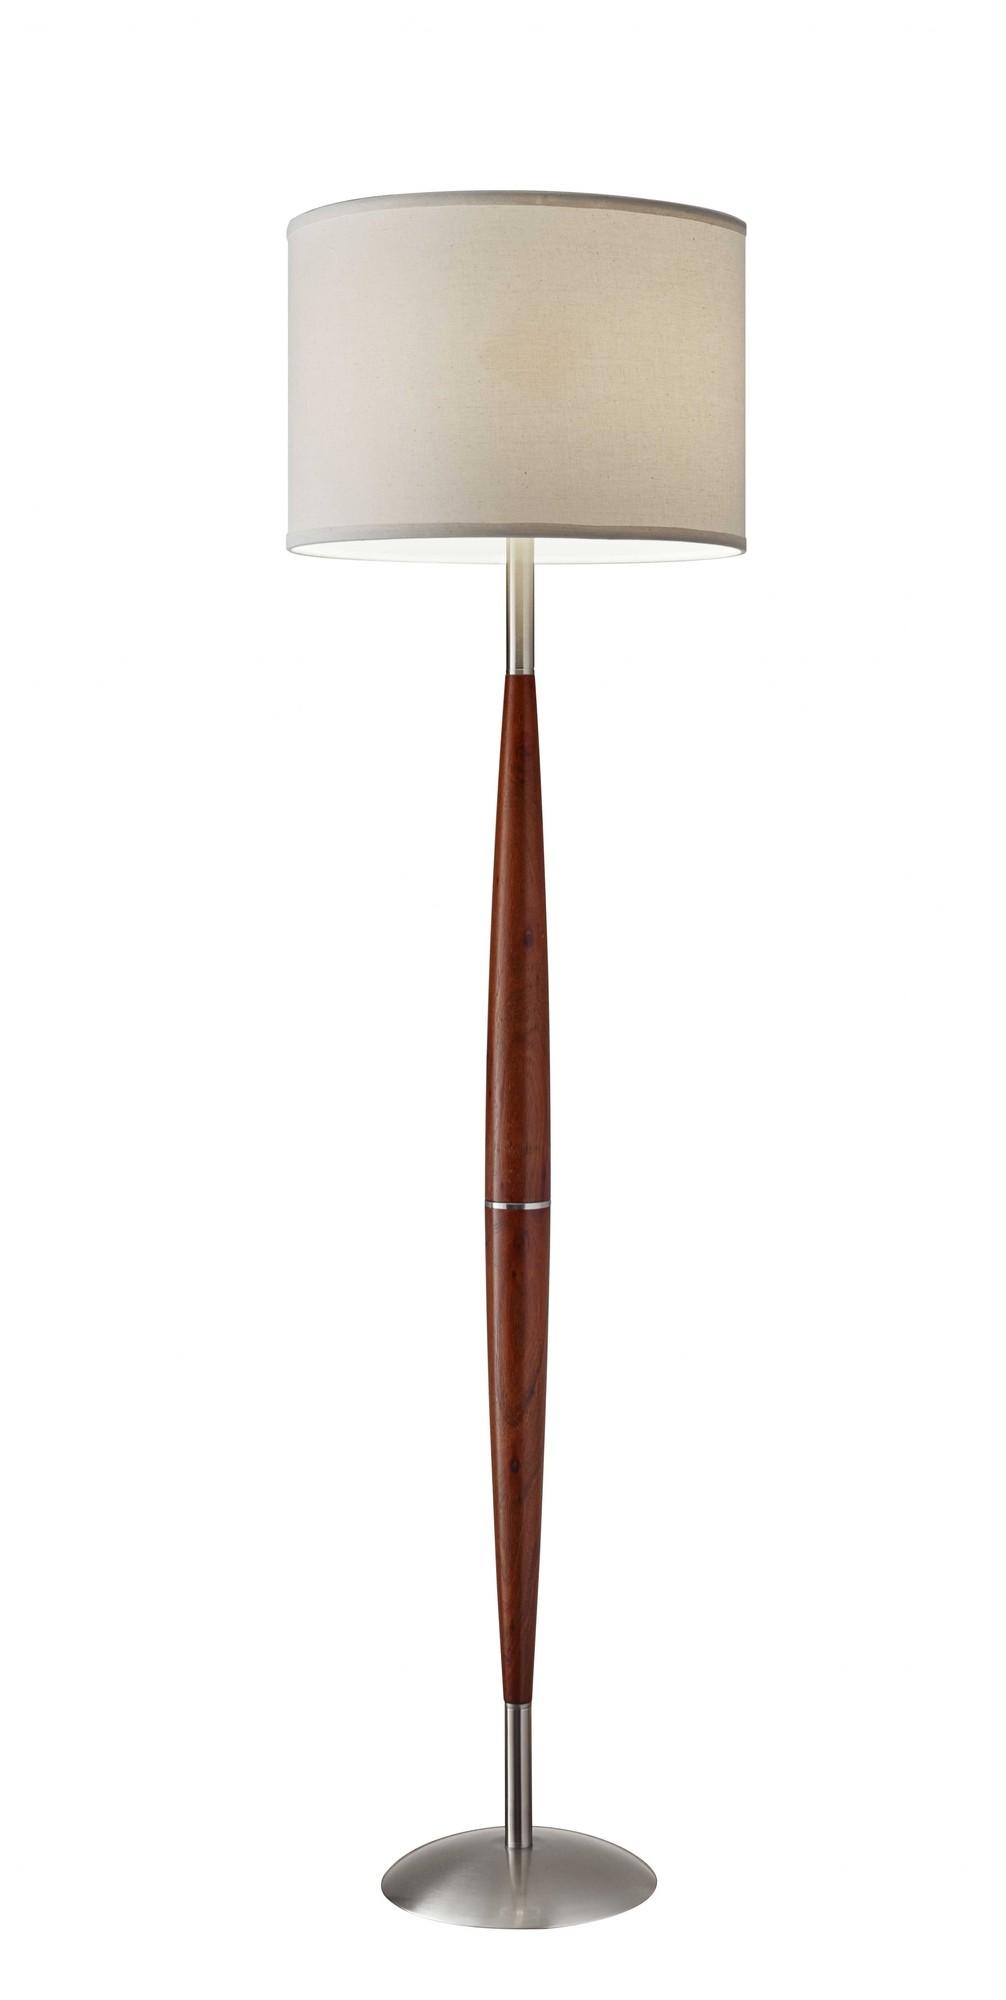 "16"" X 10"" X 61"" Walnut Wood Floor Lamp"